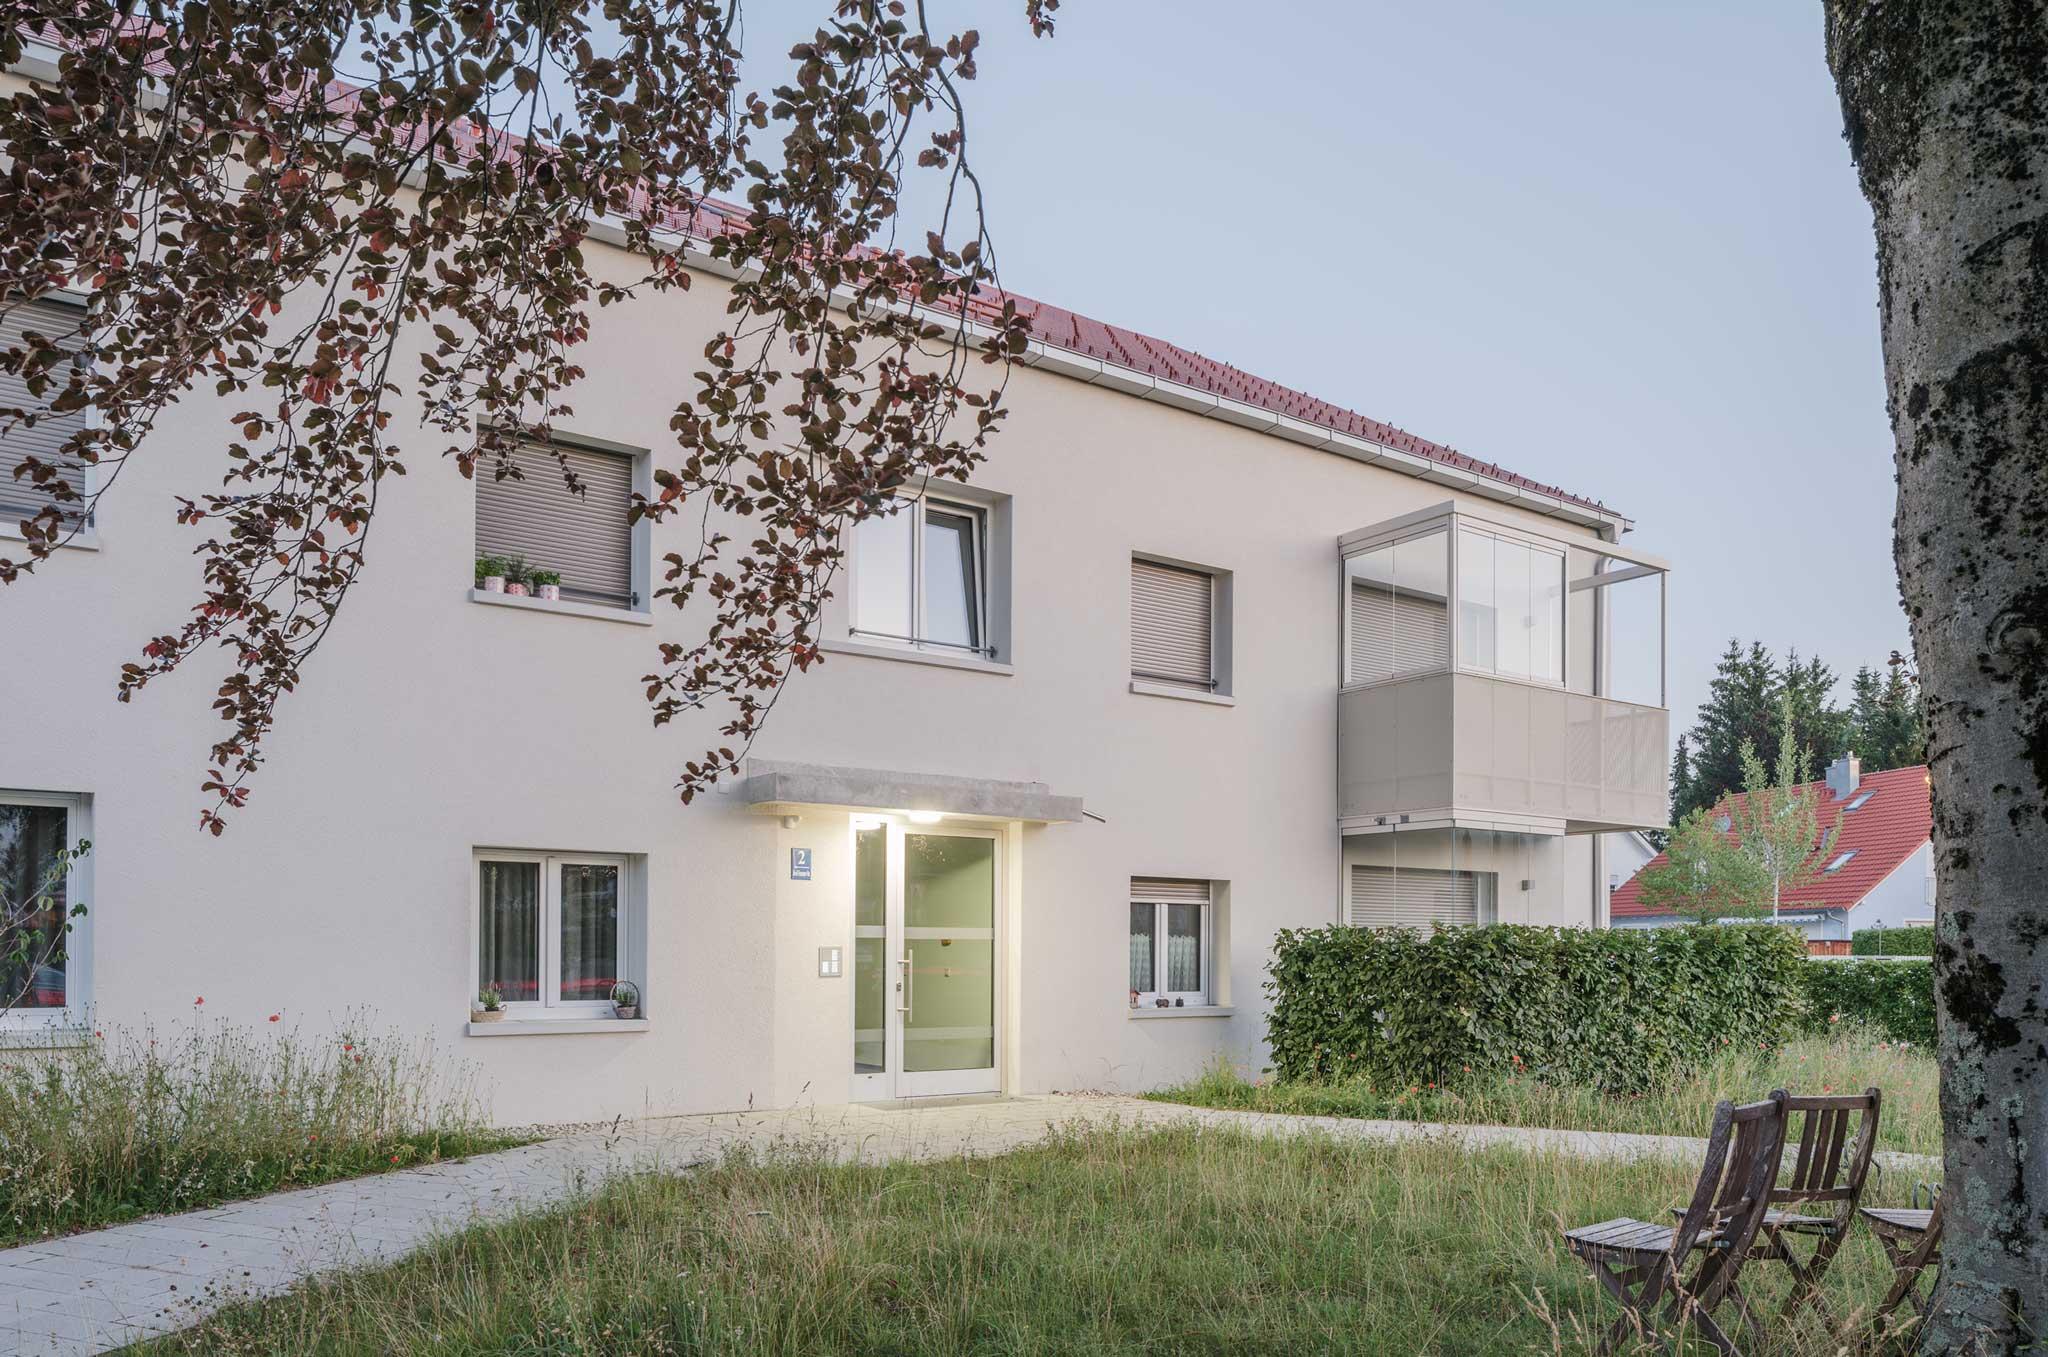 Landschaftsarchitektur Wohnanlage Grünwald - Situation Hauseingang